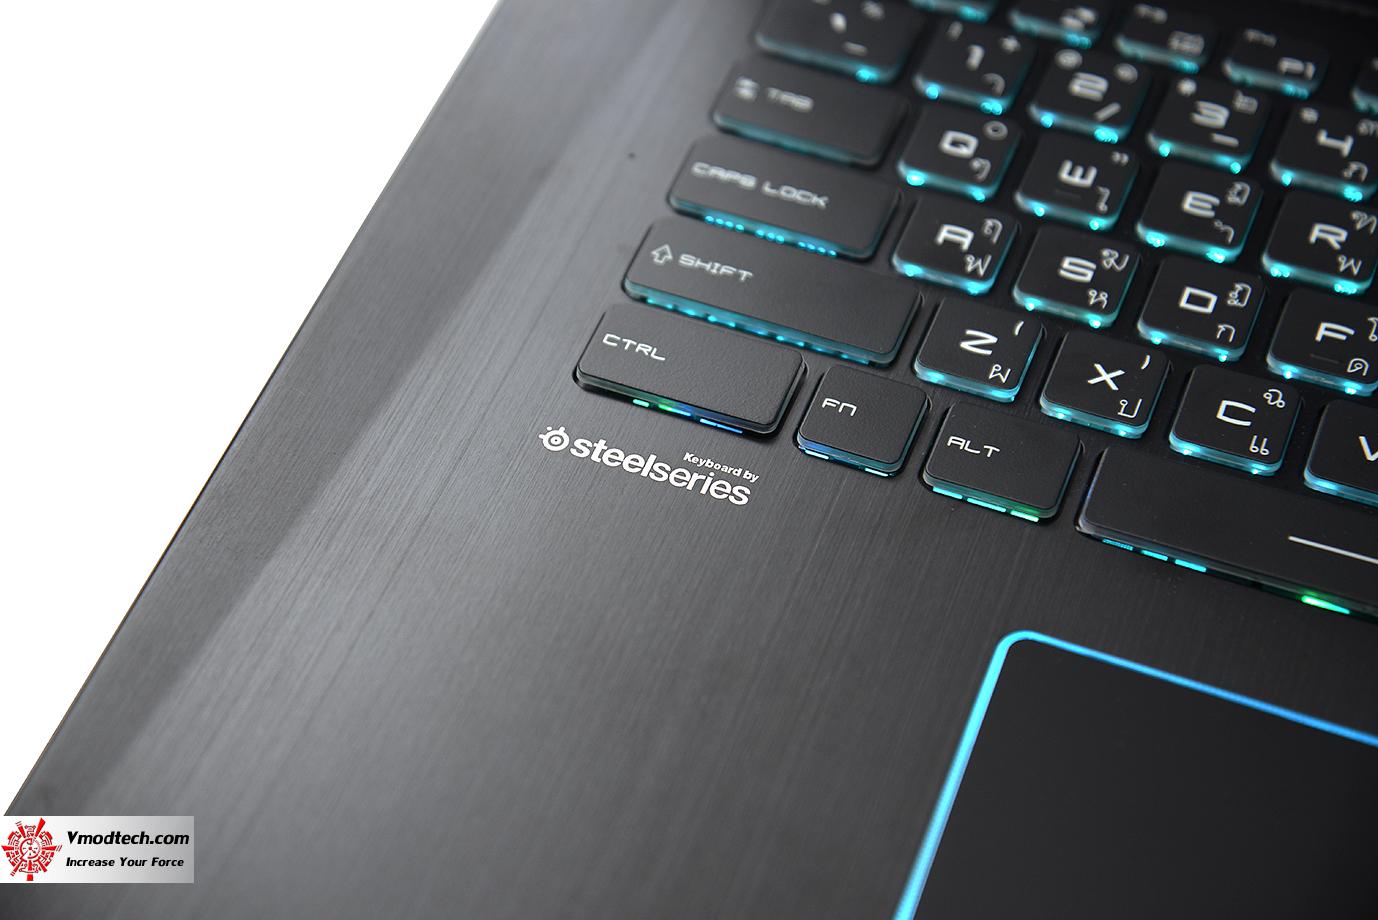 dsc 4839 MSI GT73VR 6RF Titan Pro Review